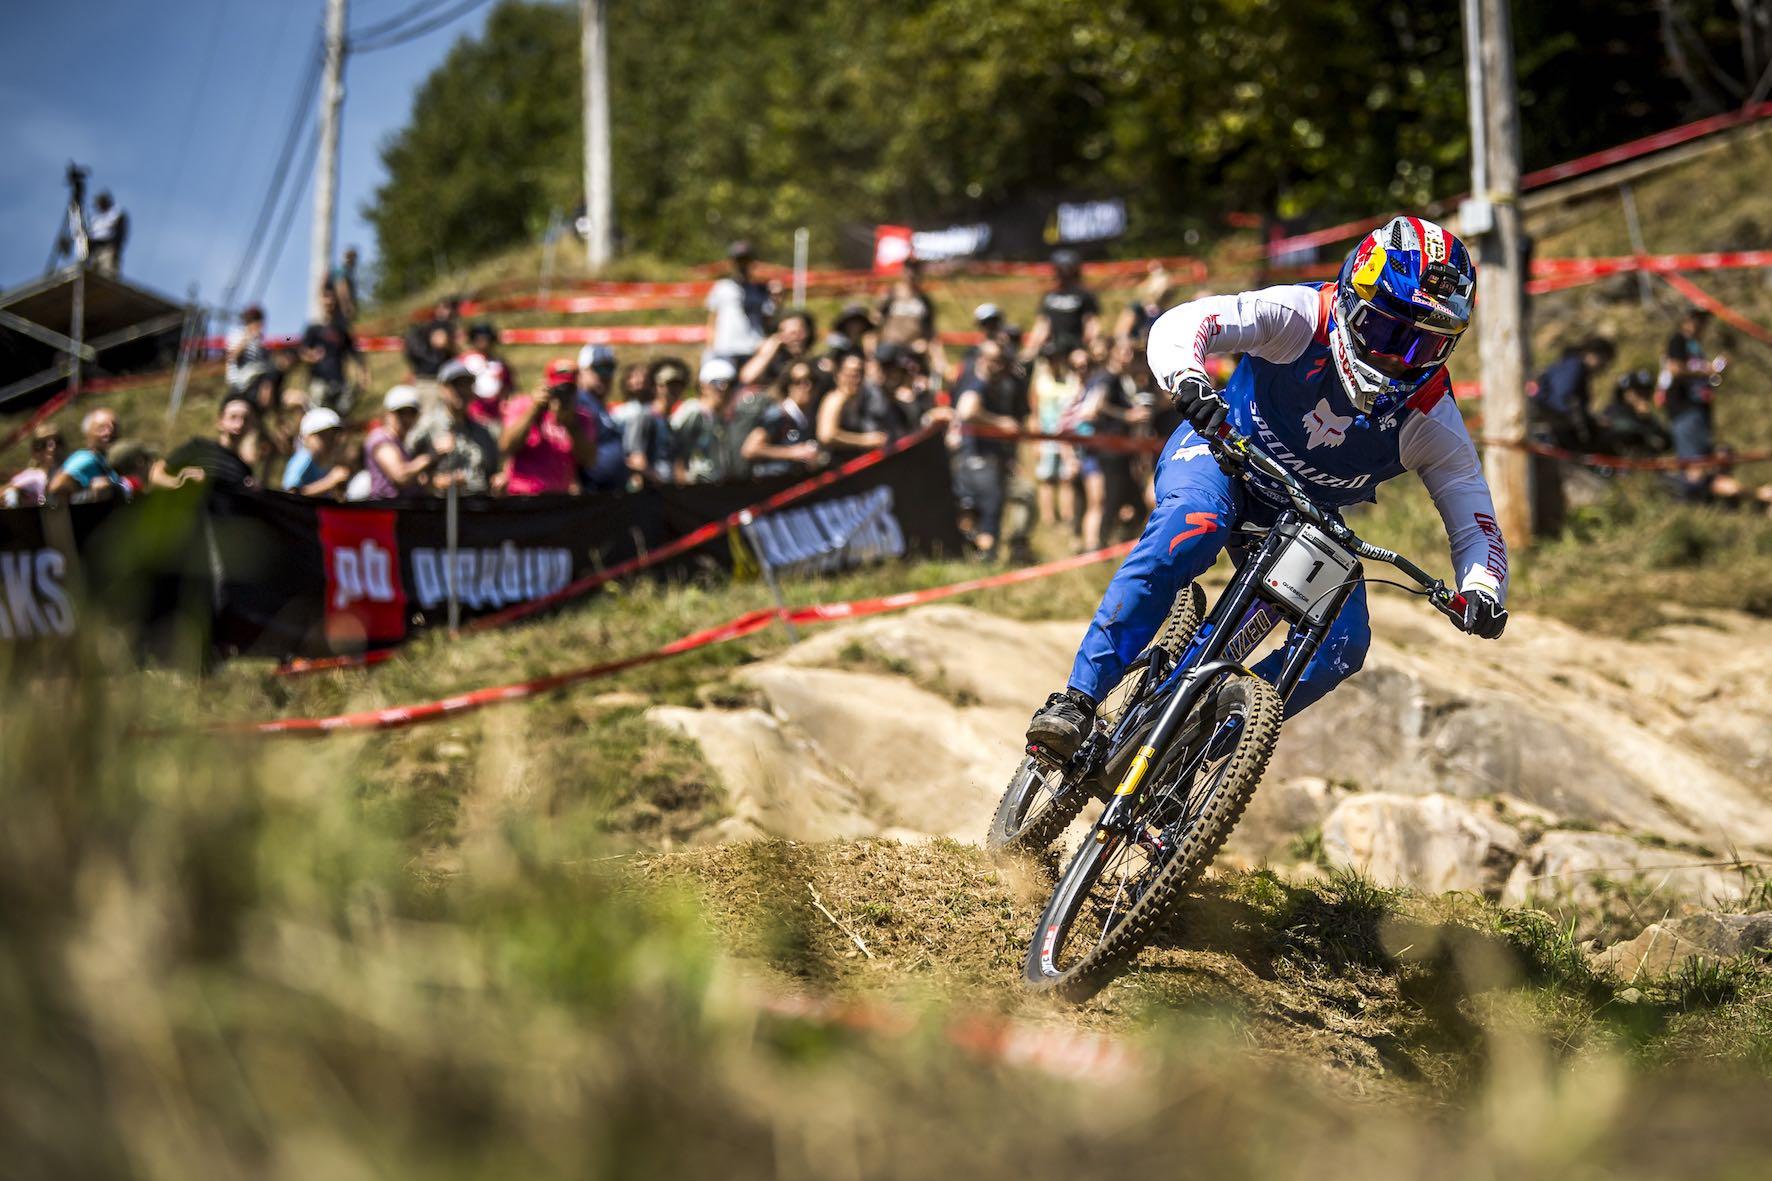 Loic Bruni racing the 2019 UCI Downhill MTB World Championship in Mont-Sainte-Ann